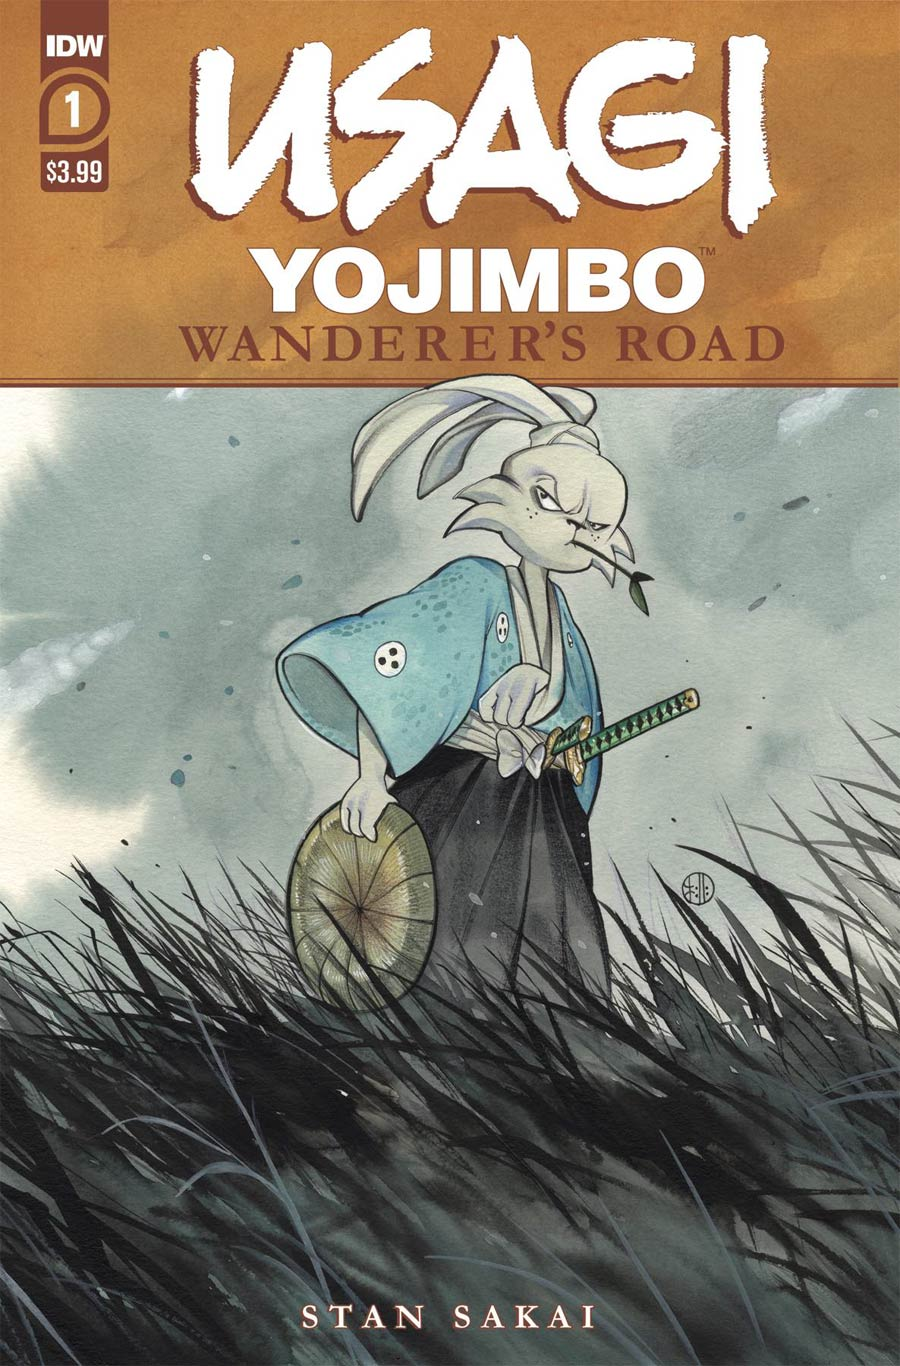 Usagi Yojimbo Wanderers Road #1